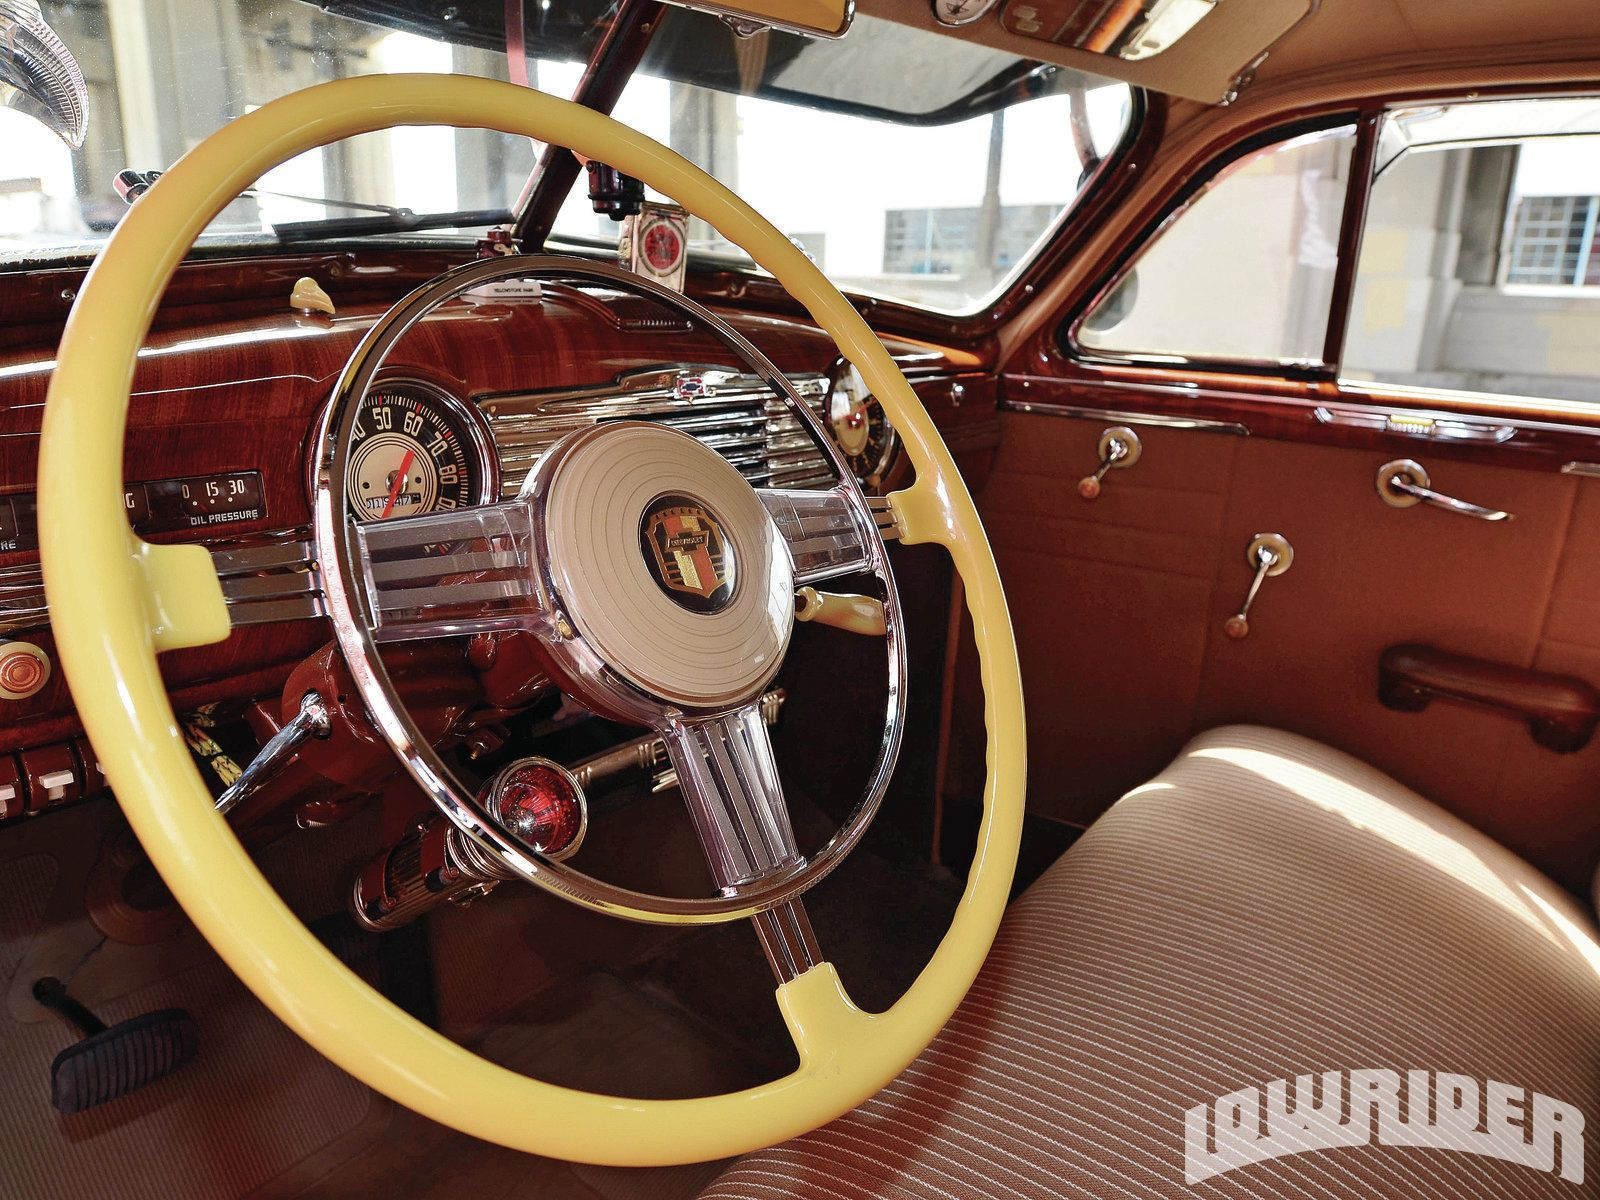 47 Chevy Fleetline Aerosedan Classic Cars Vintage Chevrolet